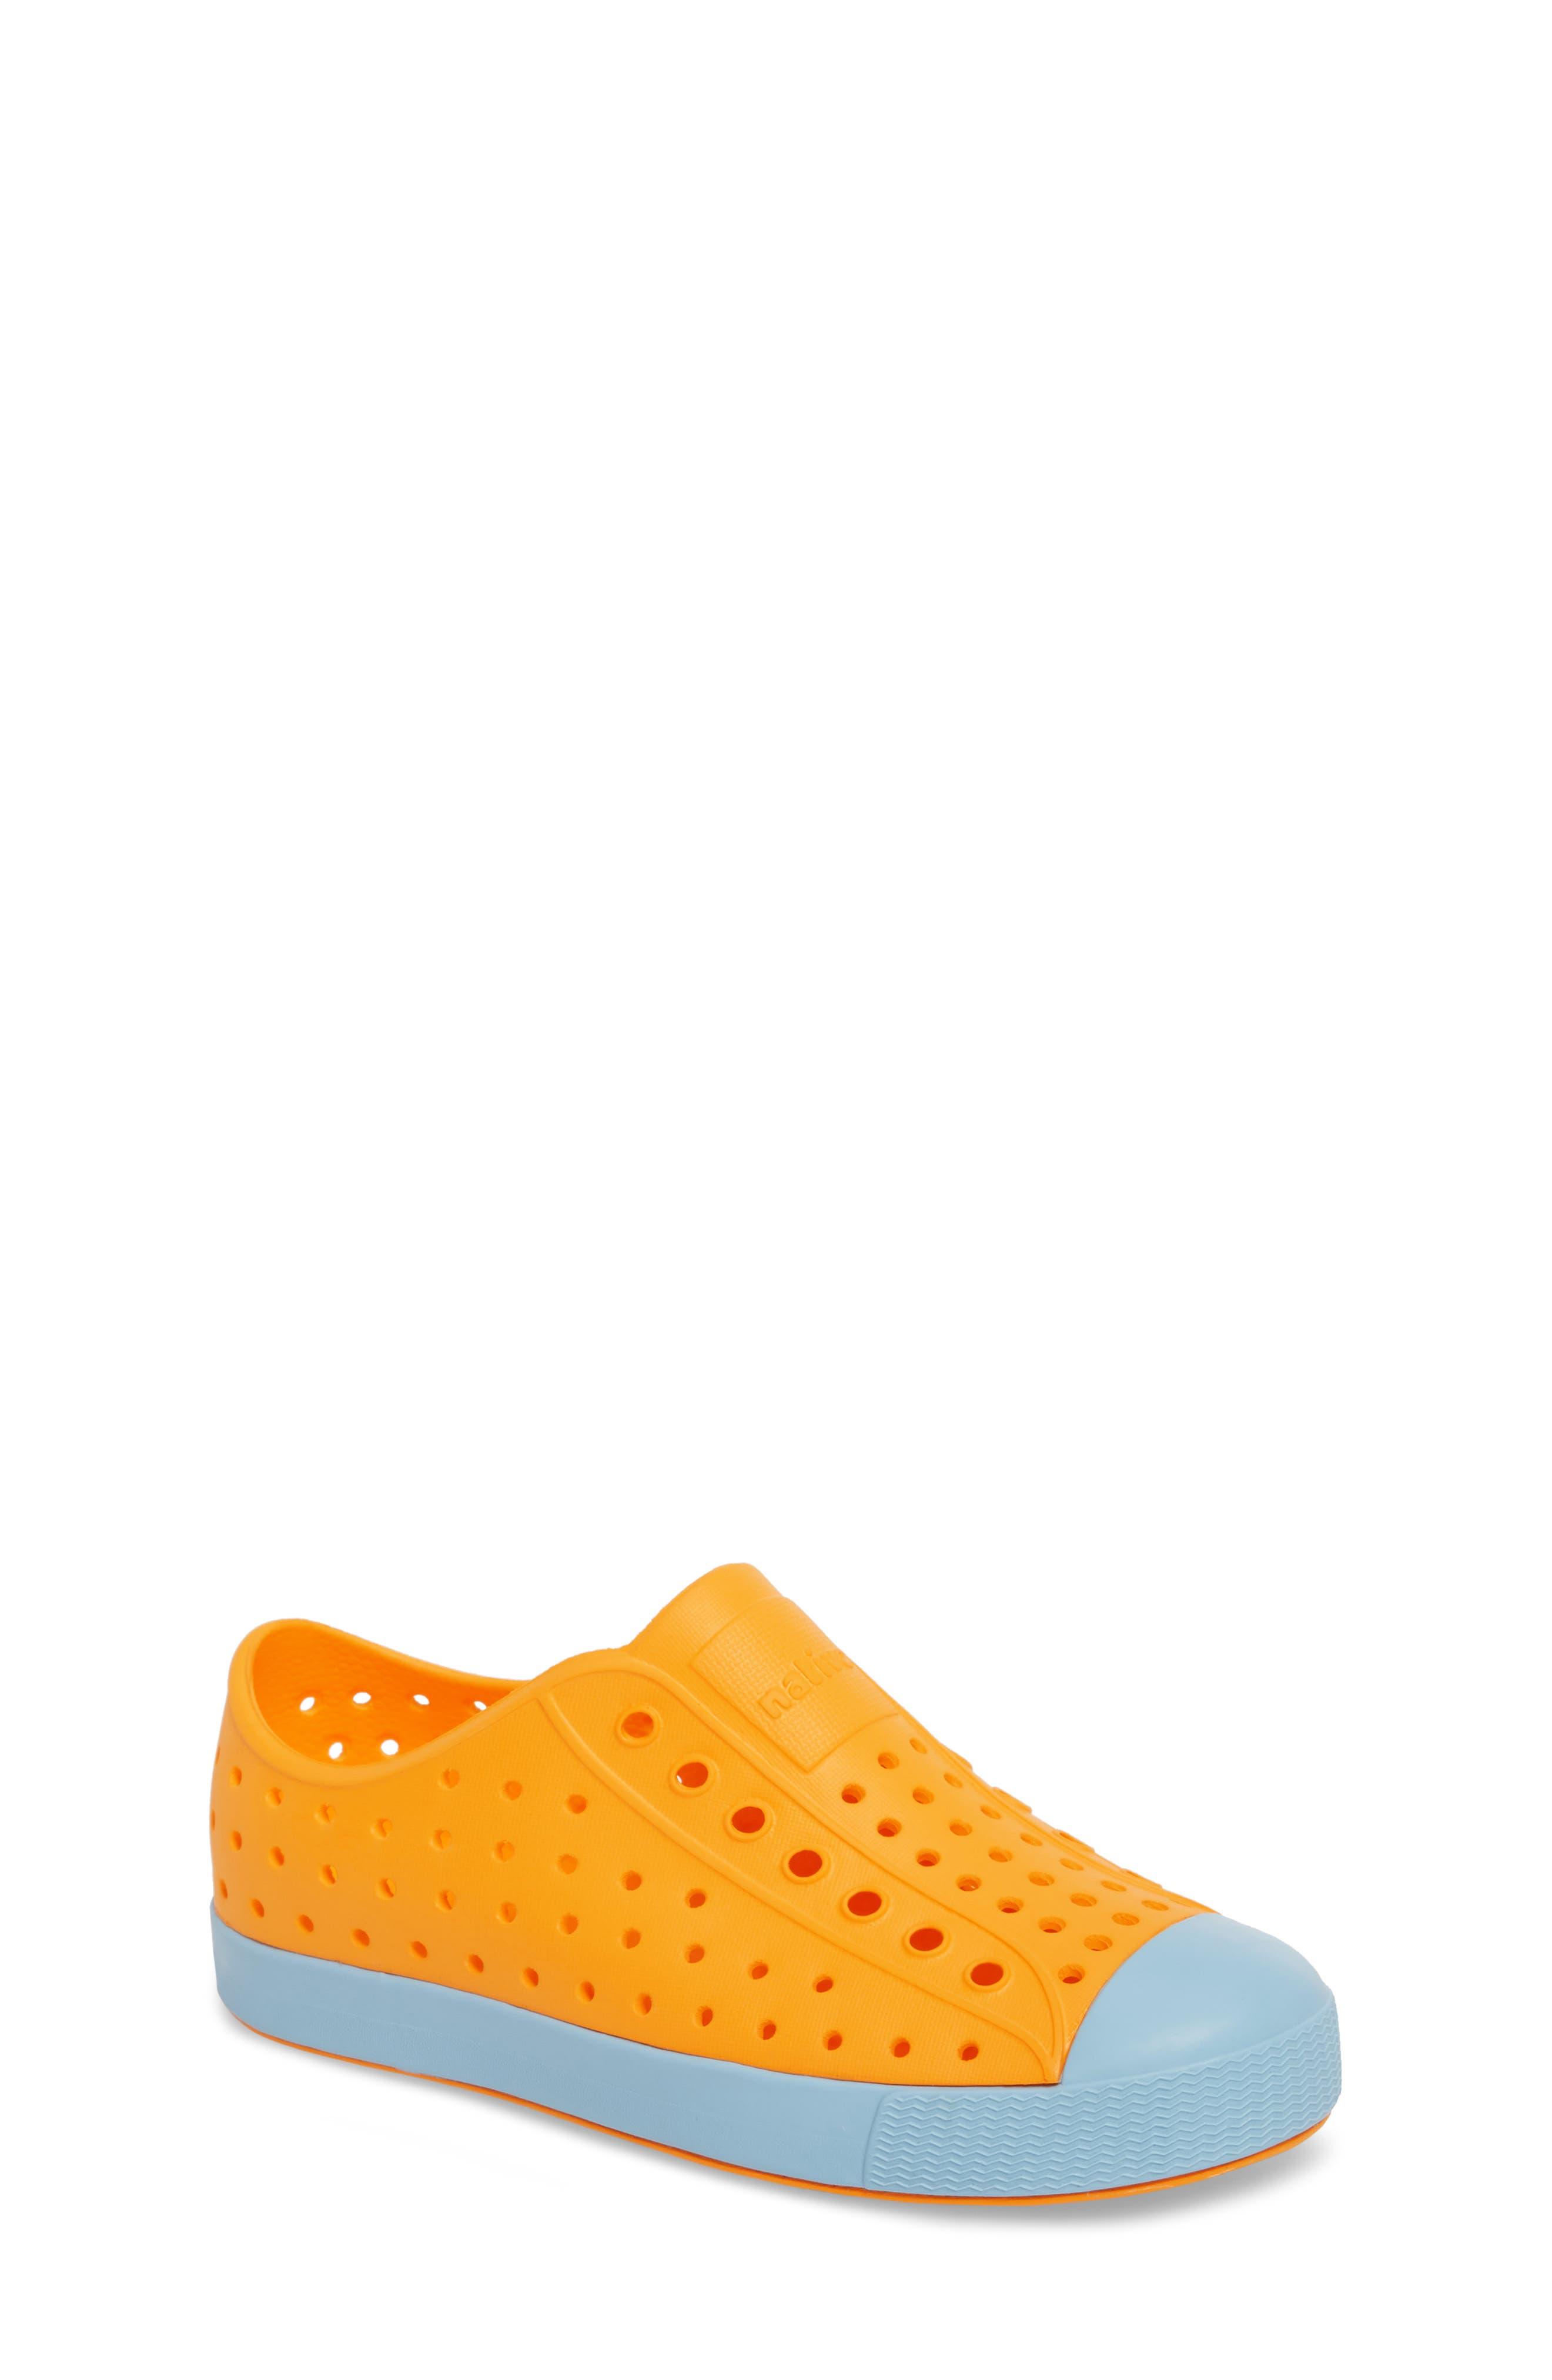 'Jefferson' Water Friendly Slip-On Sneaker,                             Main thumbnail 27, color,